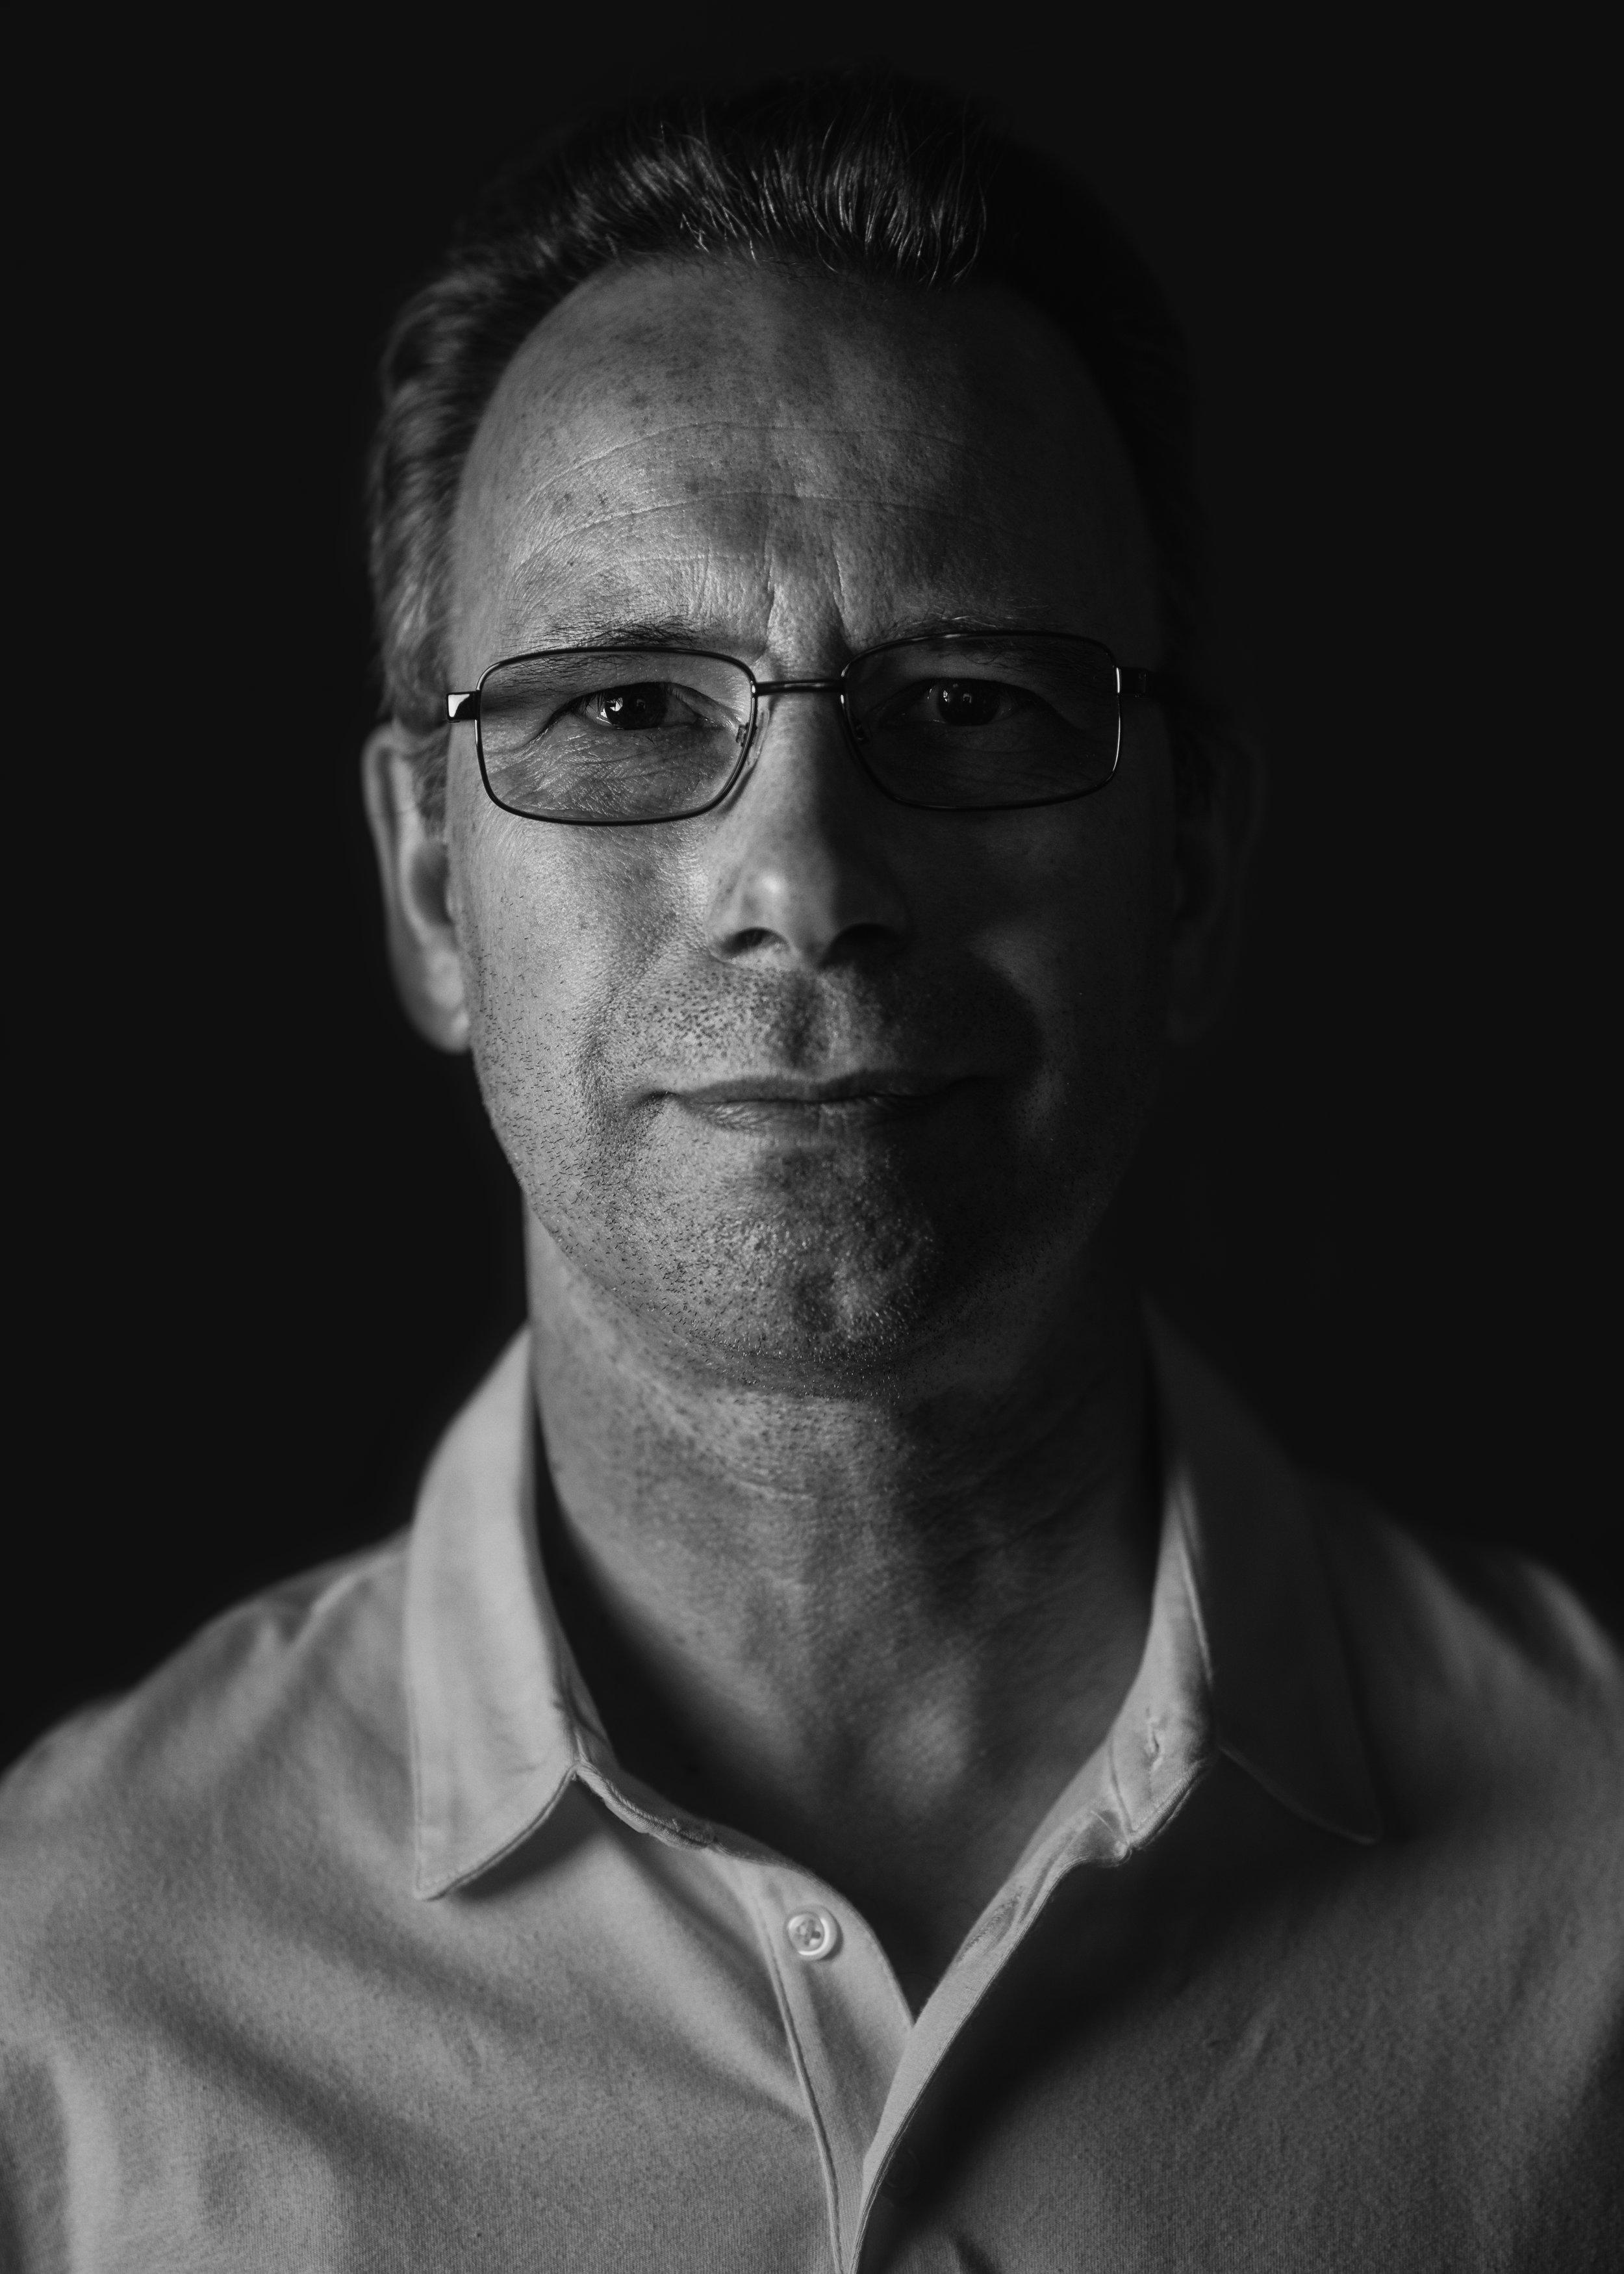 Daniel_Hull_Lowkey_Headshot_Portrait_Scott_Cameron_Wanstall_Ayrshire_Photographer